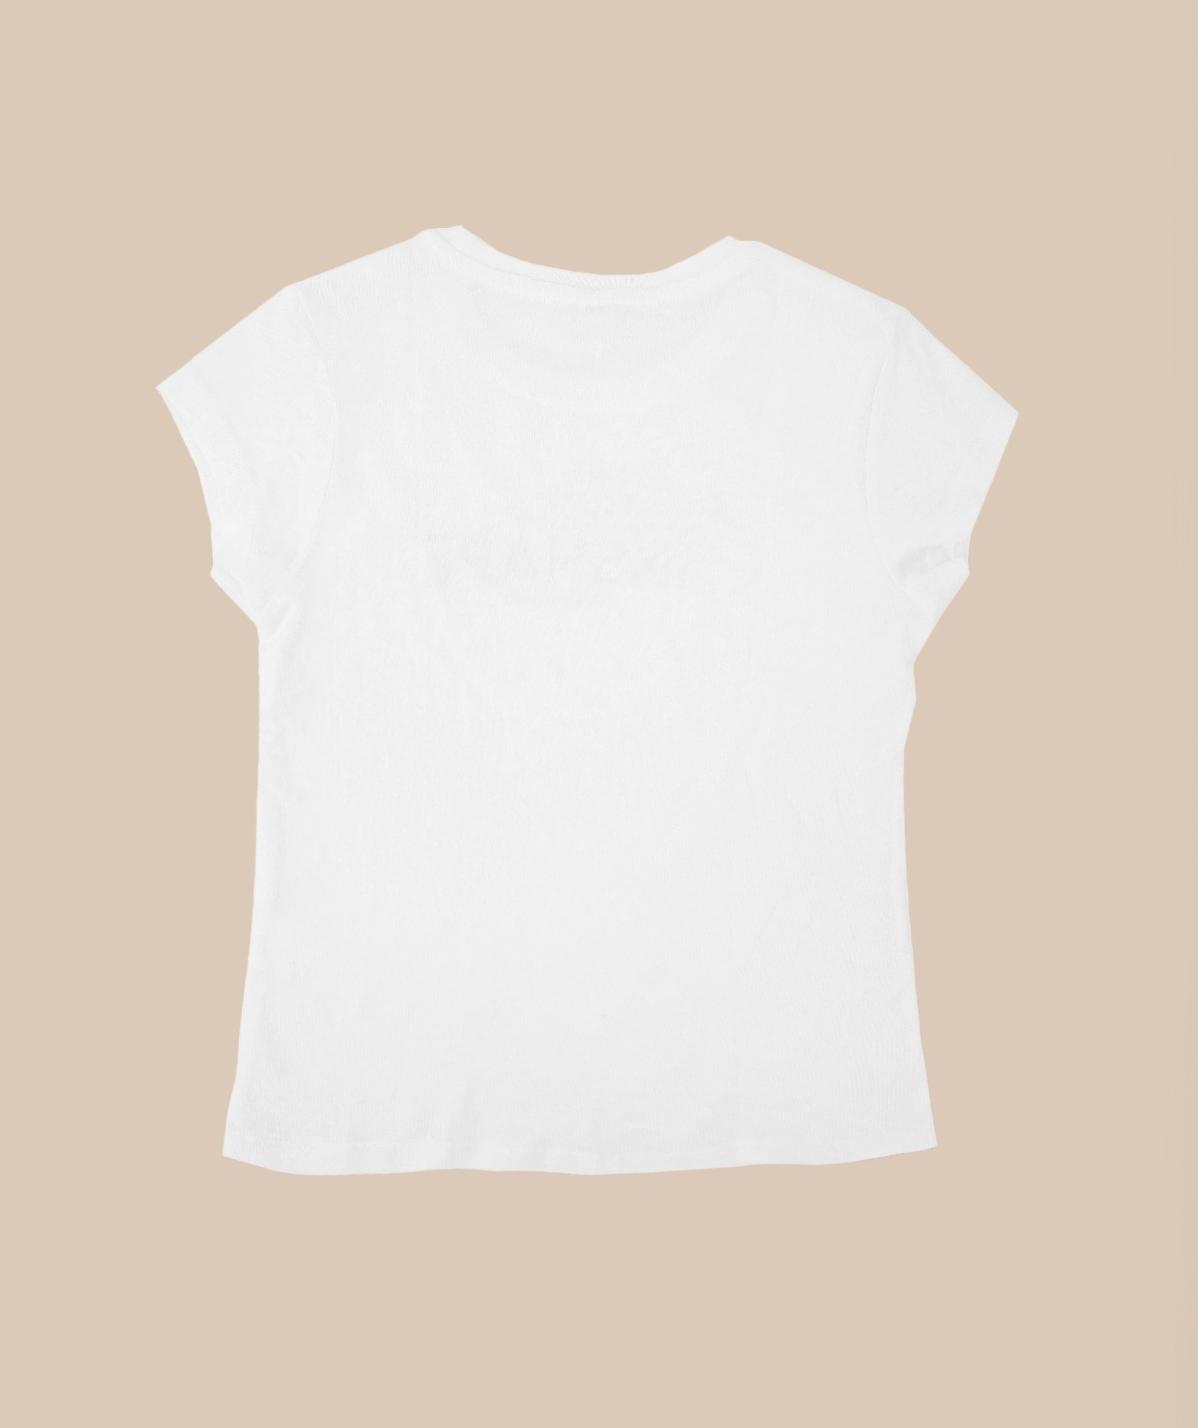 T-shirt Blanc Petite InShape